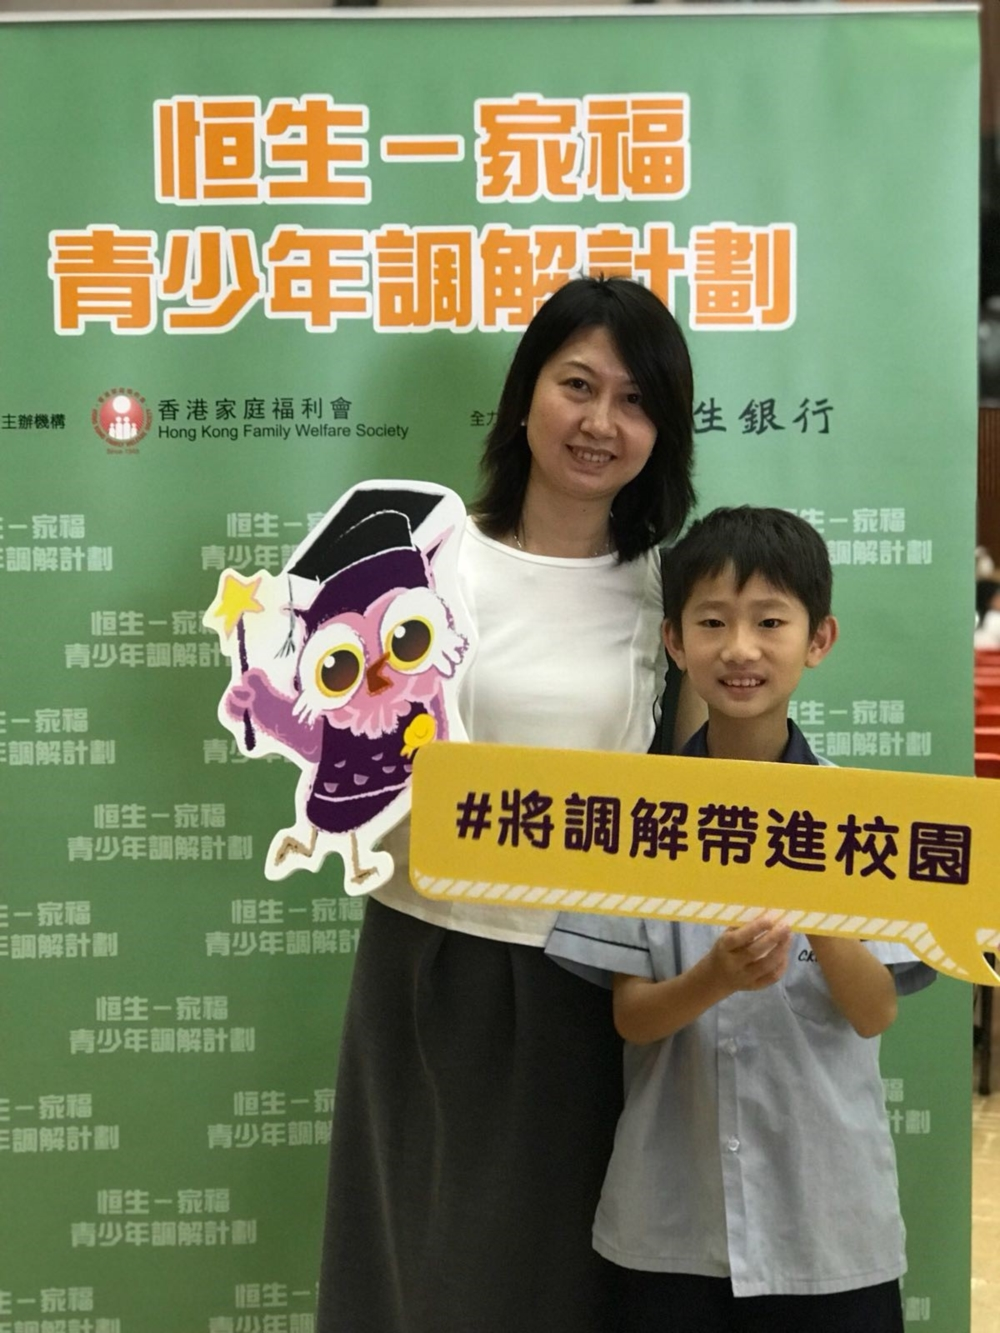 https://www.pohckwps.edu.hk/sites/default/files/09_21.jpg